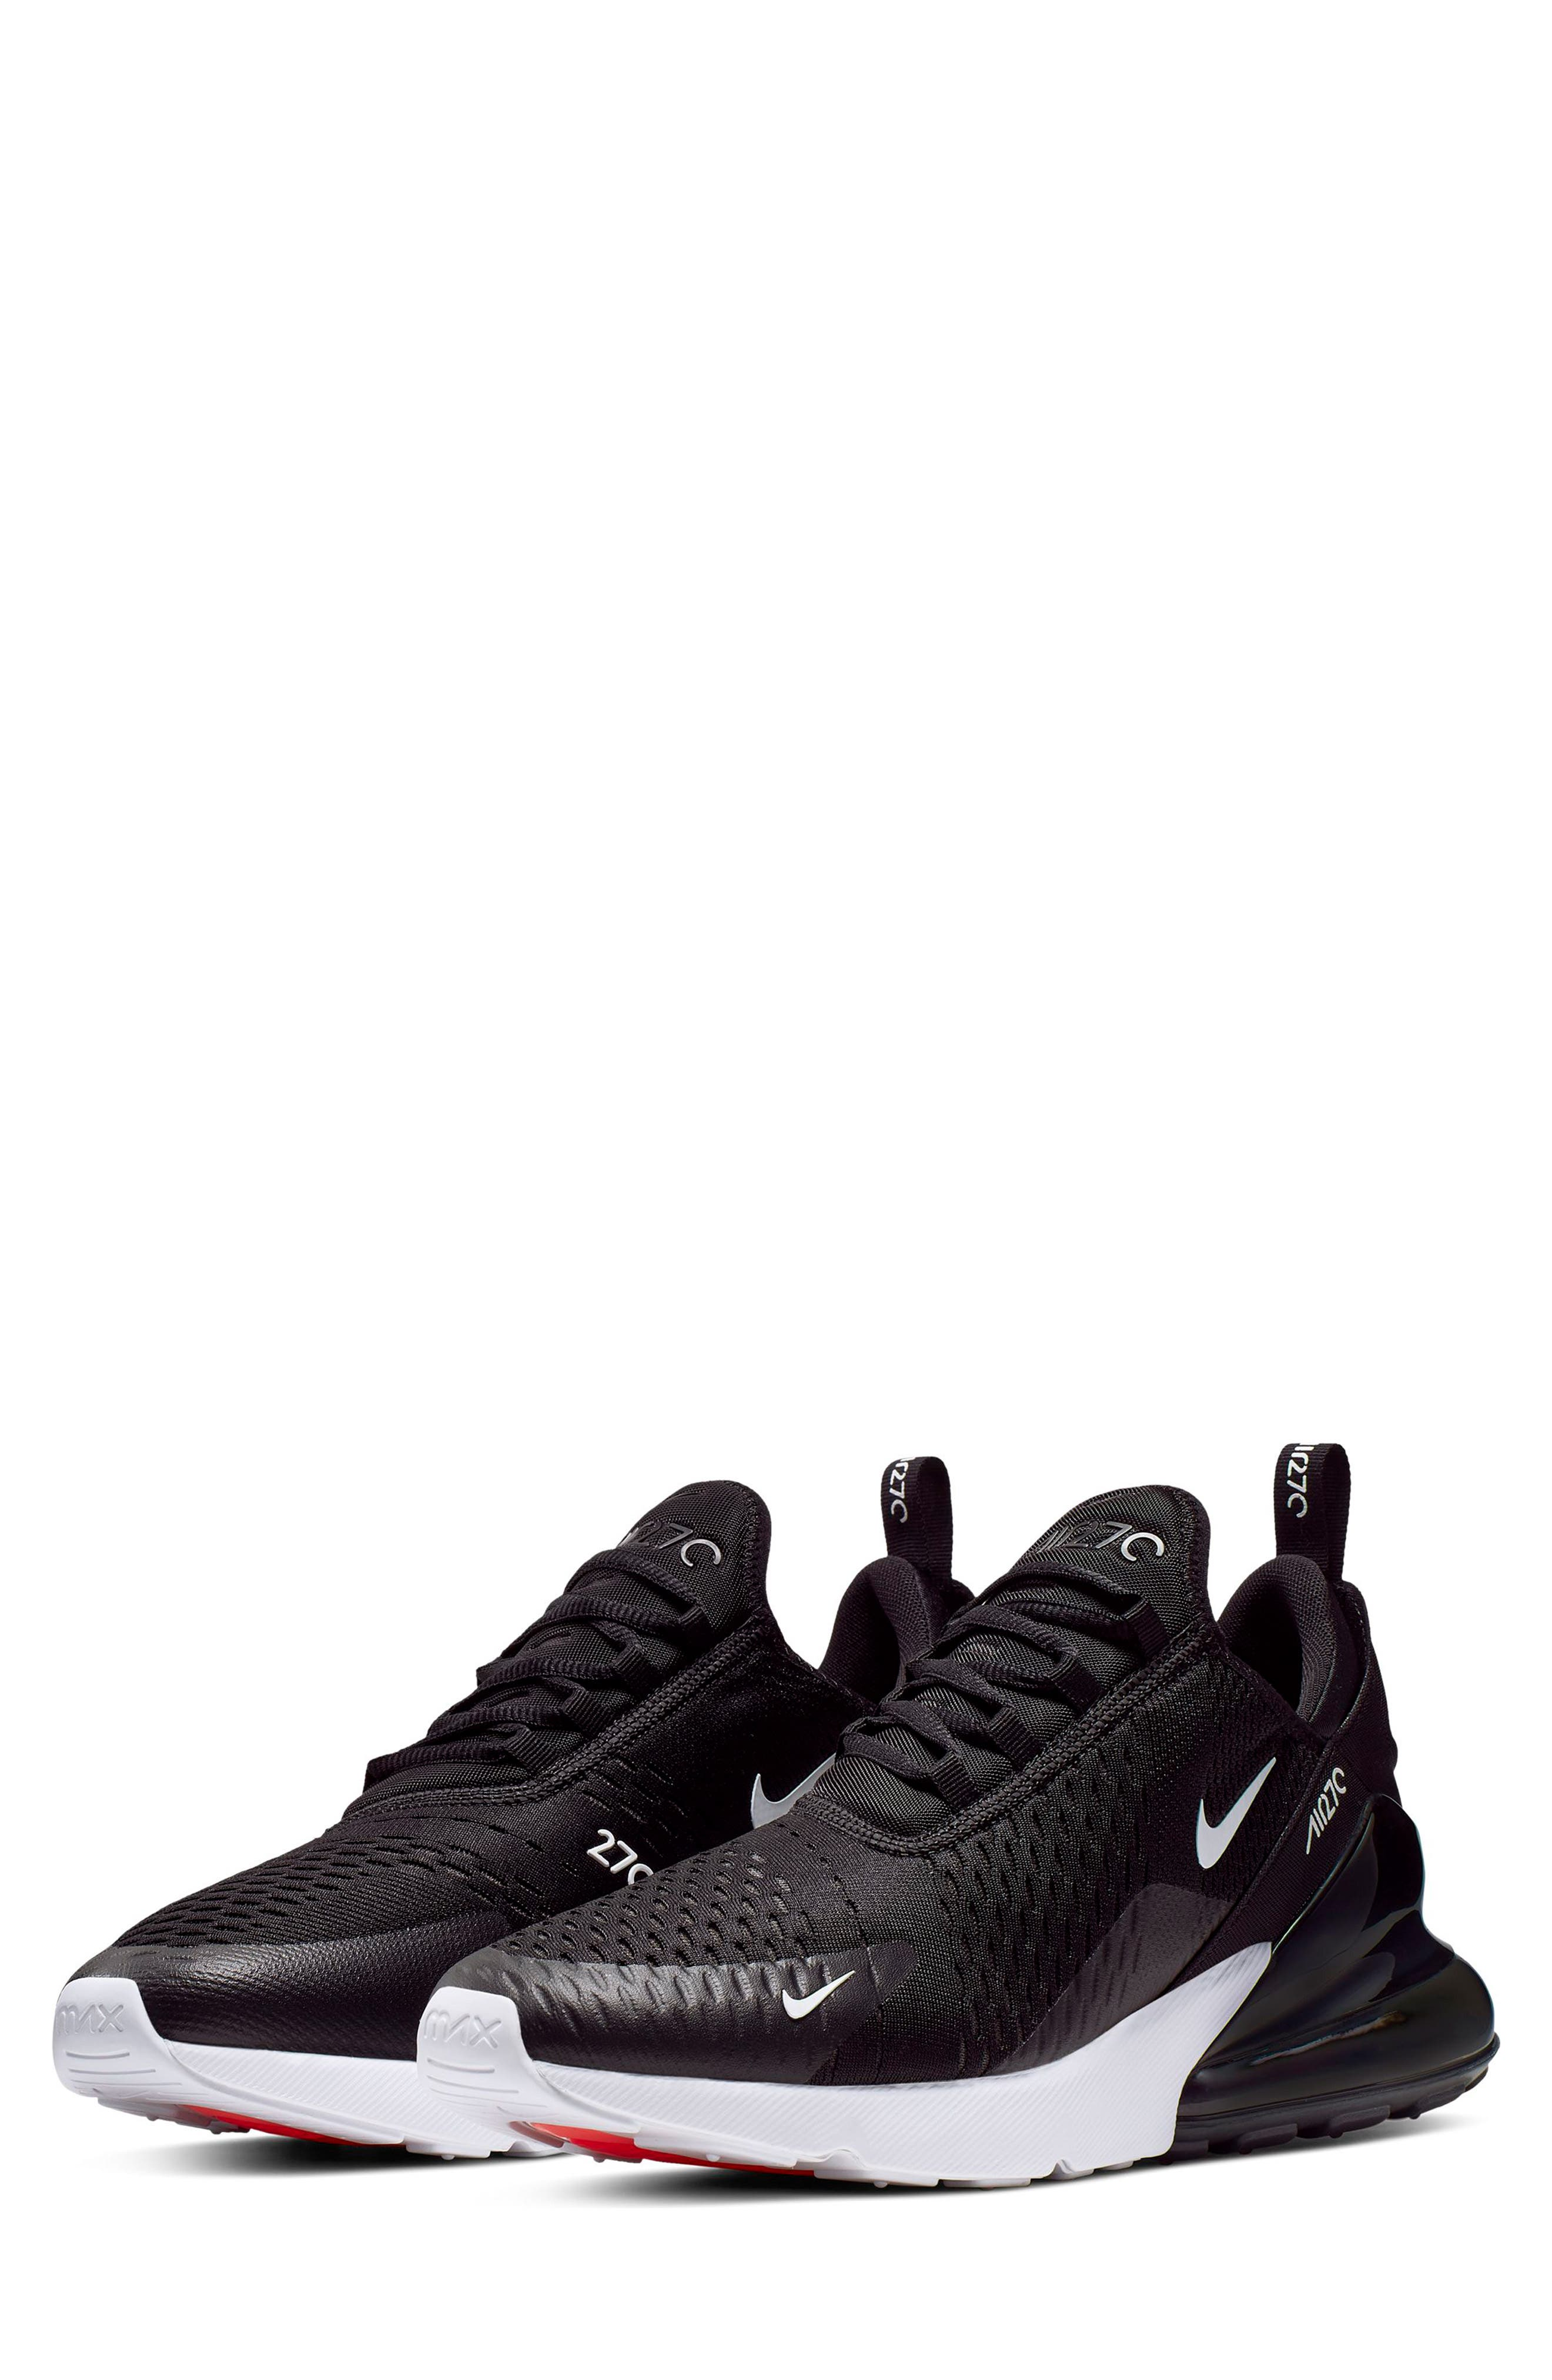 Nike Air Max 270 React Gs Grade School Older Kids Black